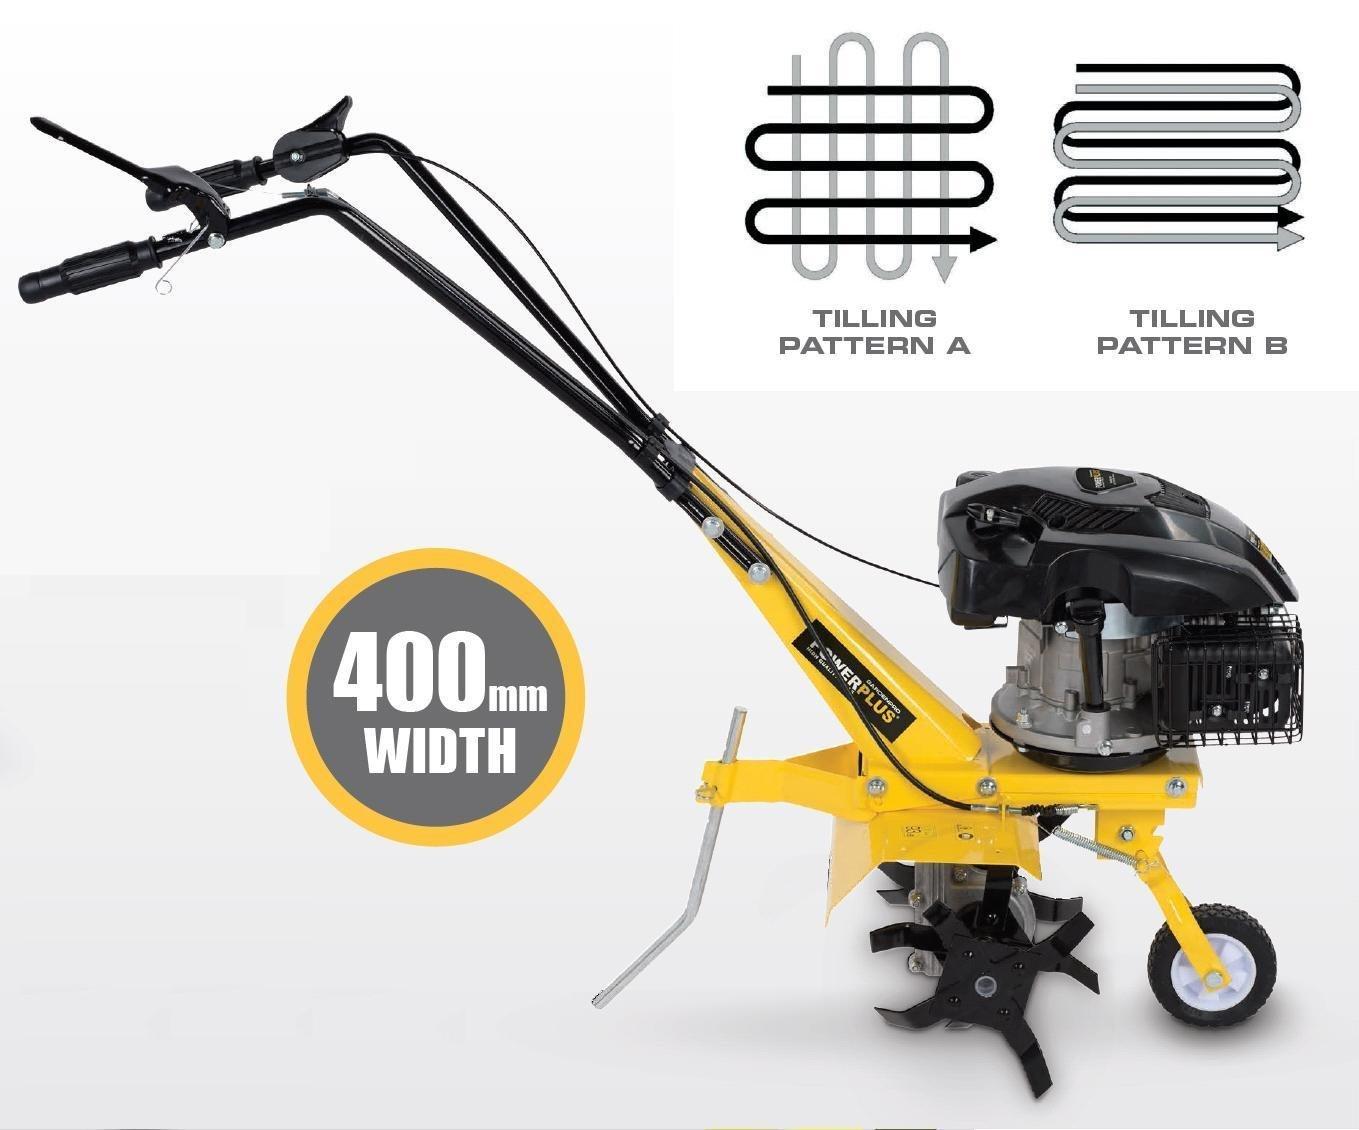 PowerPlus POWXG7204 Motocultor 140Cc: Amazon.es: Bricolaje y ...